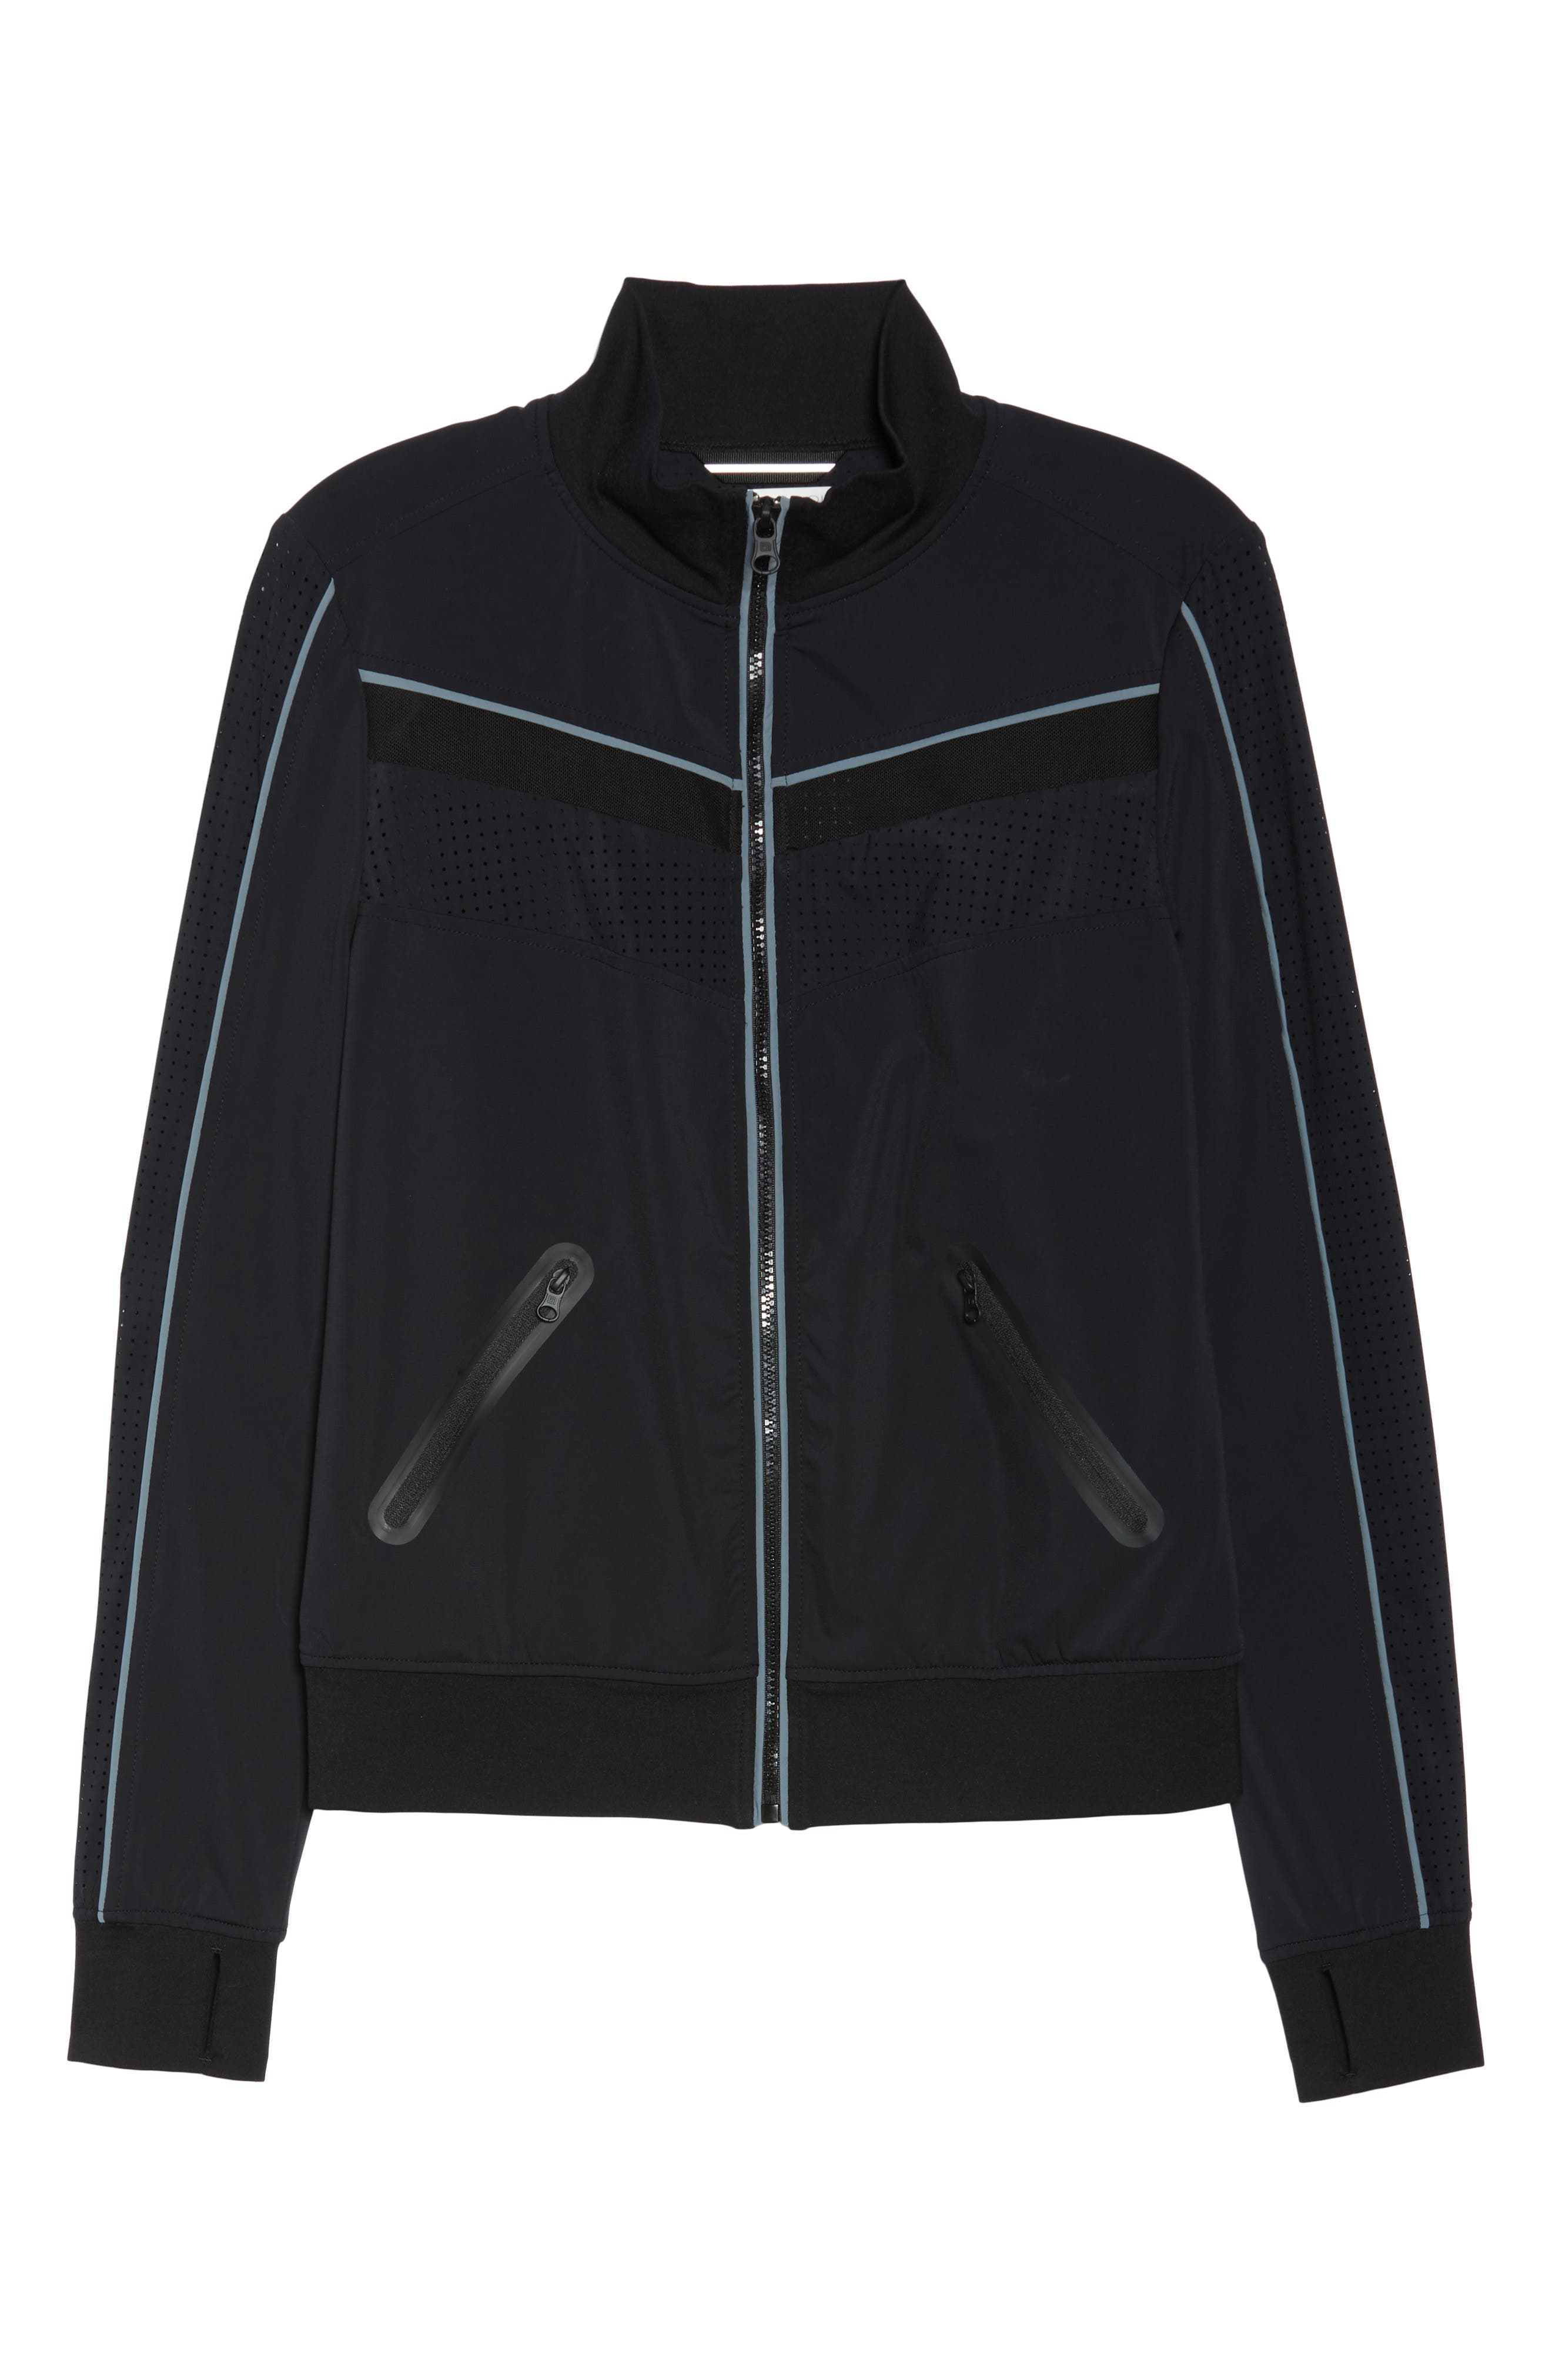 Jog Jacket,                             Alternate thumbnail 7, color,                             Black